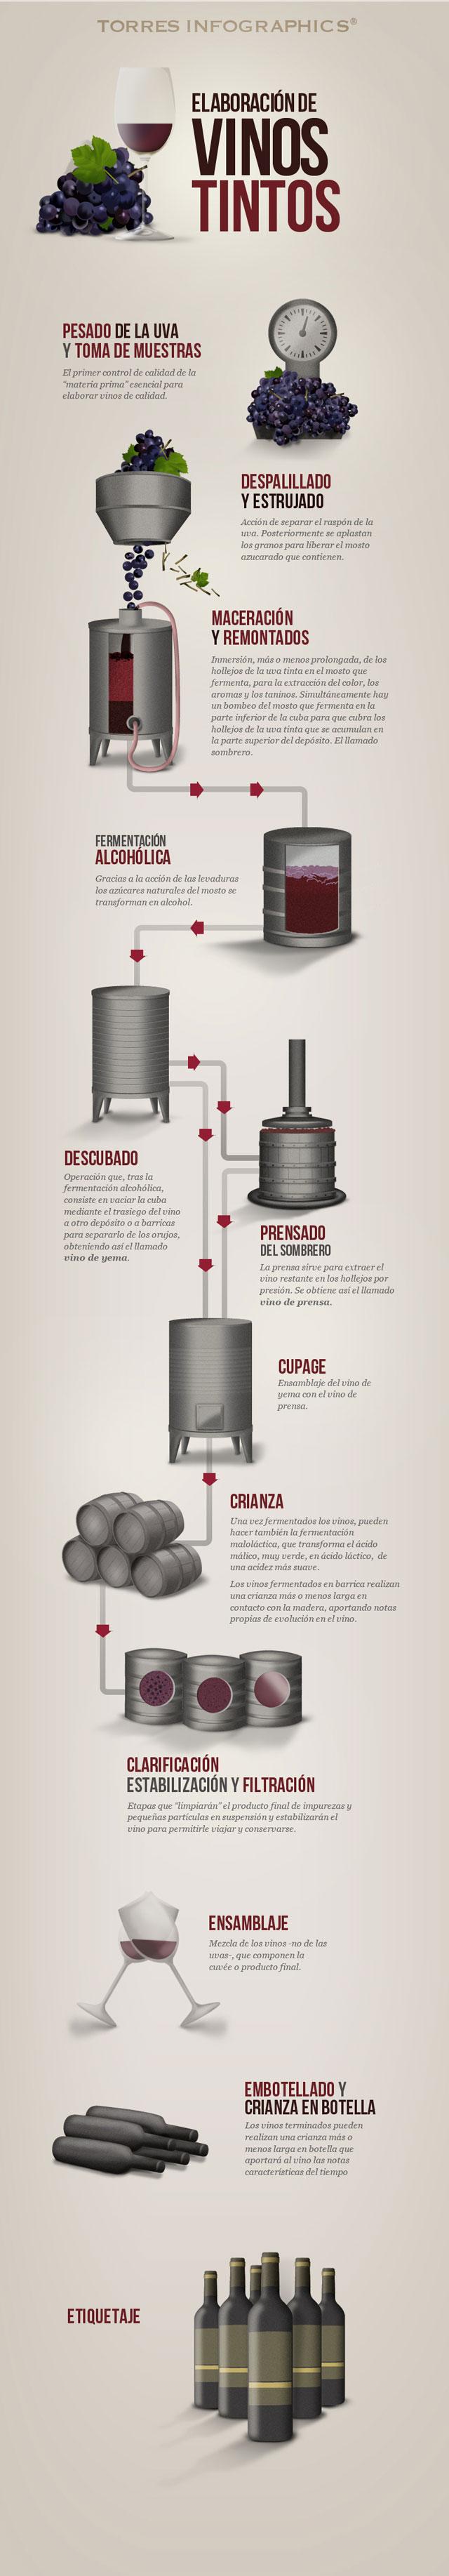 Cómo se elabora vino tinto